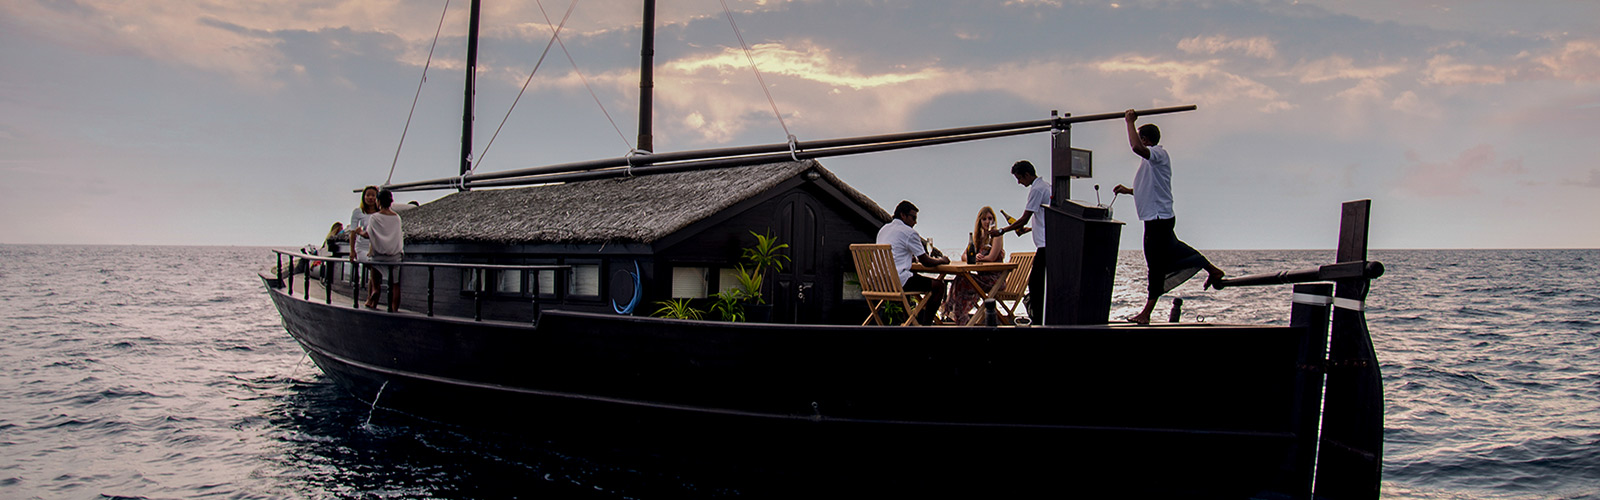 Romantic luxury cruise Maldives